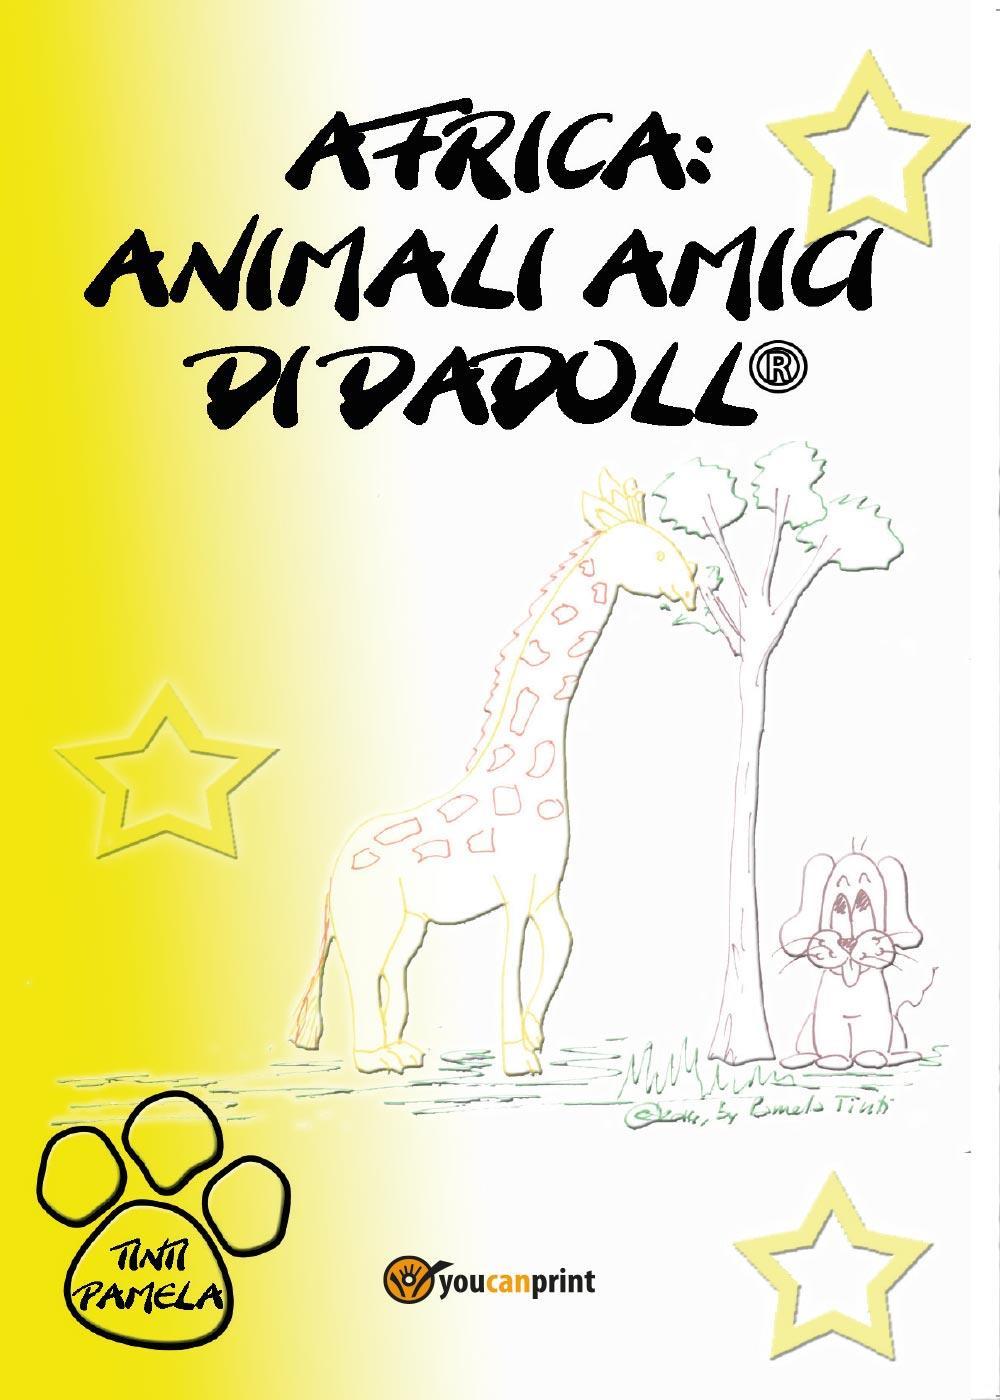 Africa: animali amici di Dadoll®